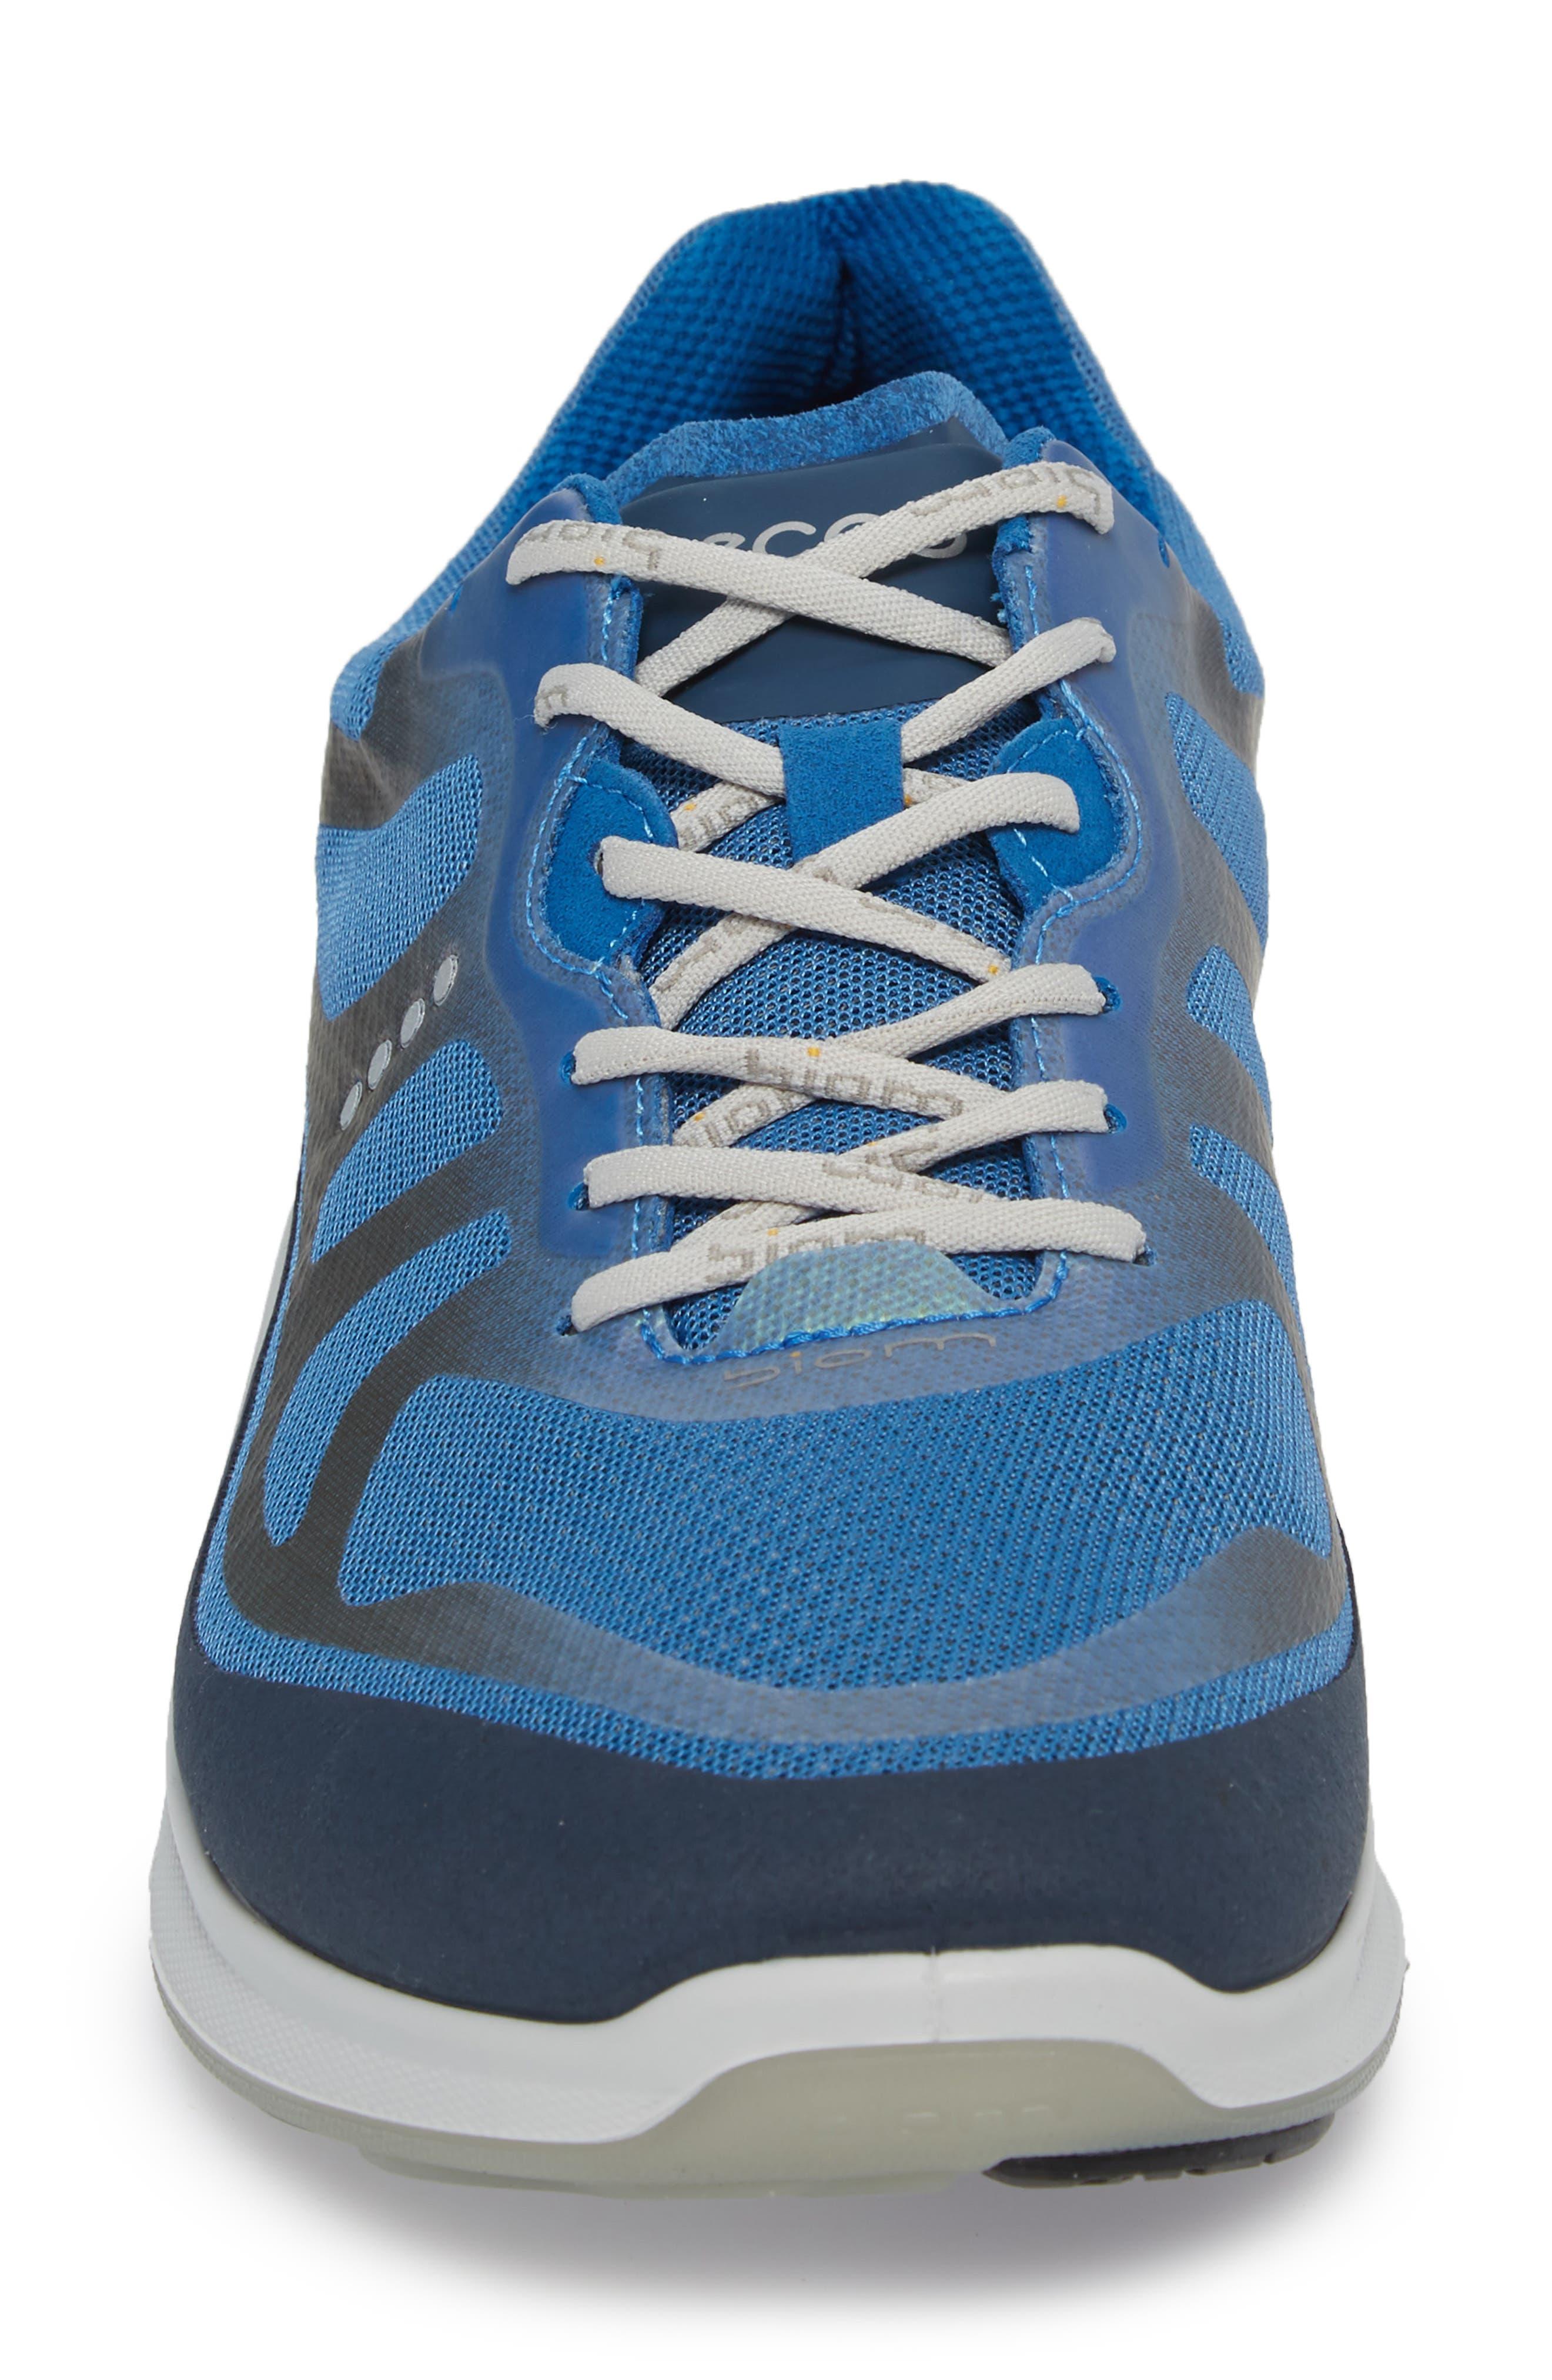 BIOM Fjuel Tie Sneaker,                             Alternate thumbnail 4, color,                             MARINE/ BLUE TEXTILE